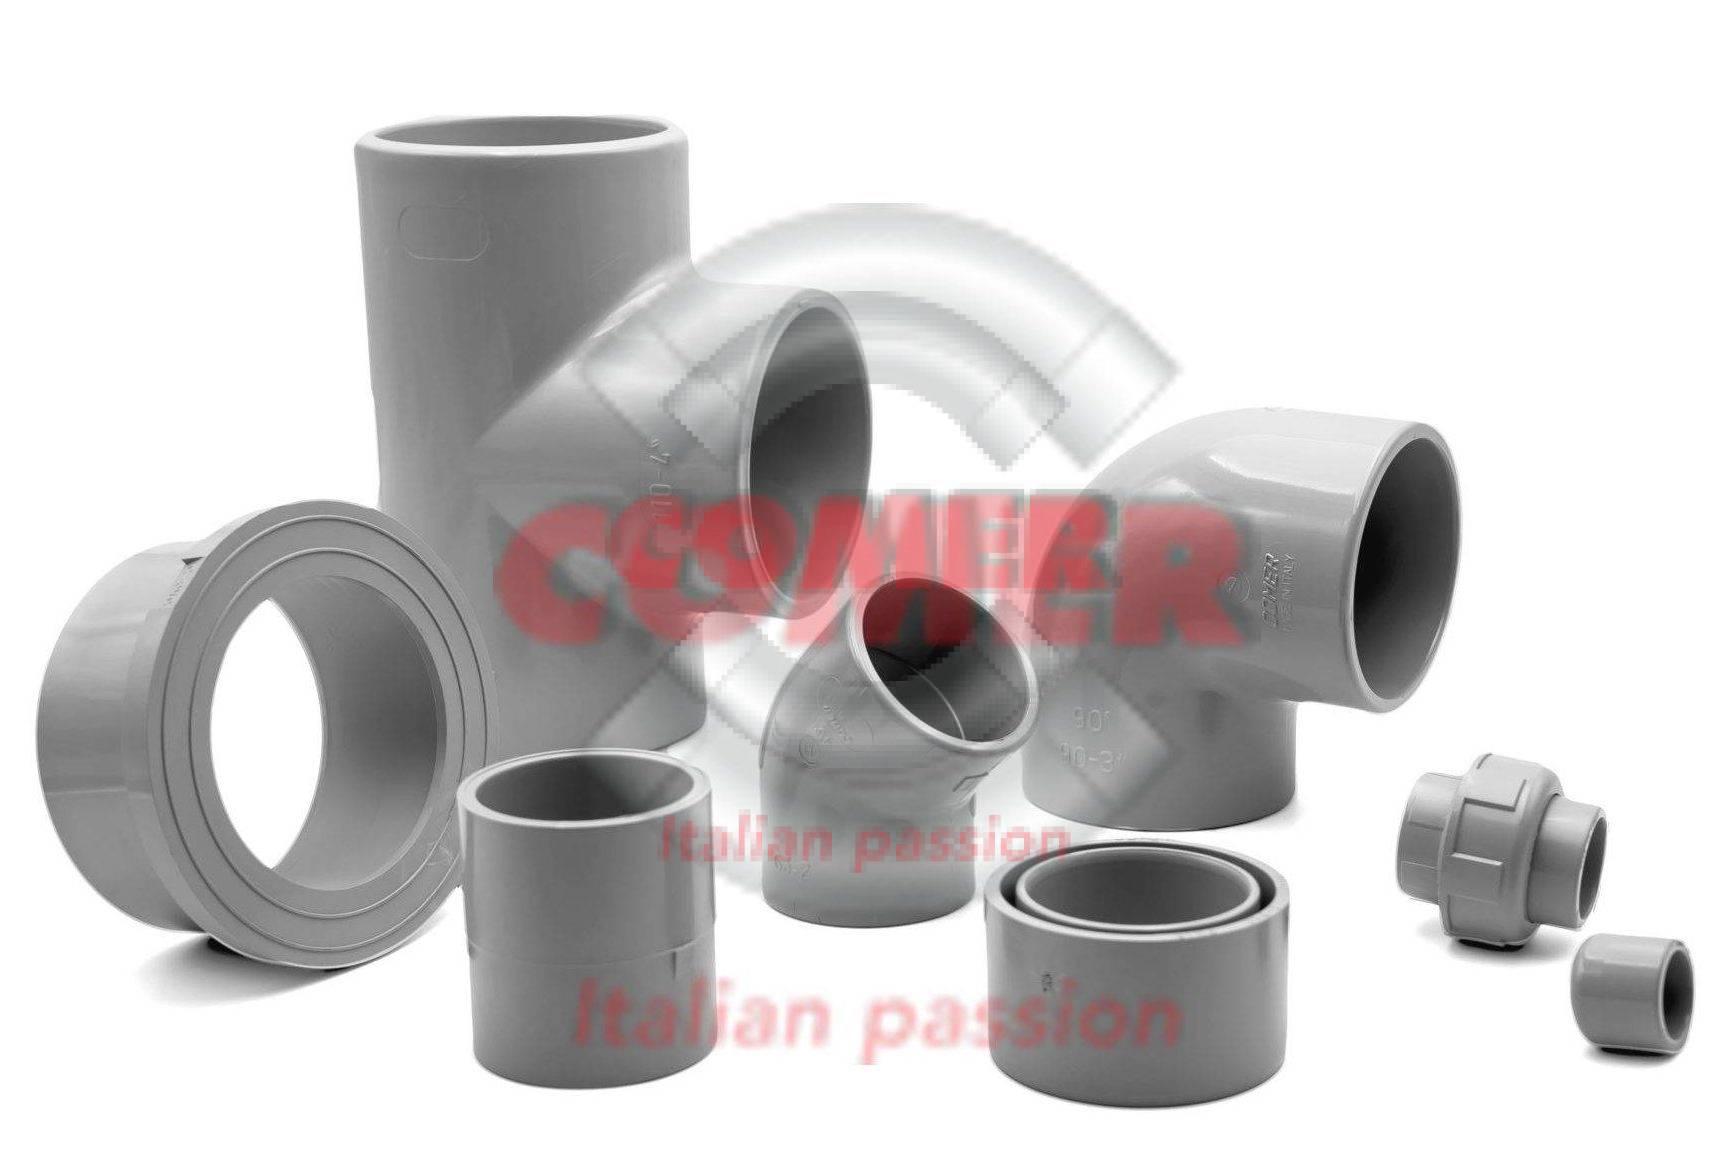 raccordi groupage PVC-C COMER S.p.A. - COMER S.p.A.